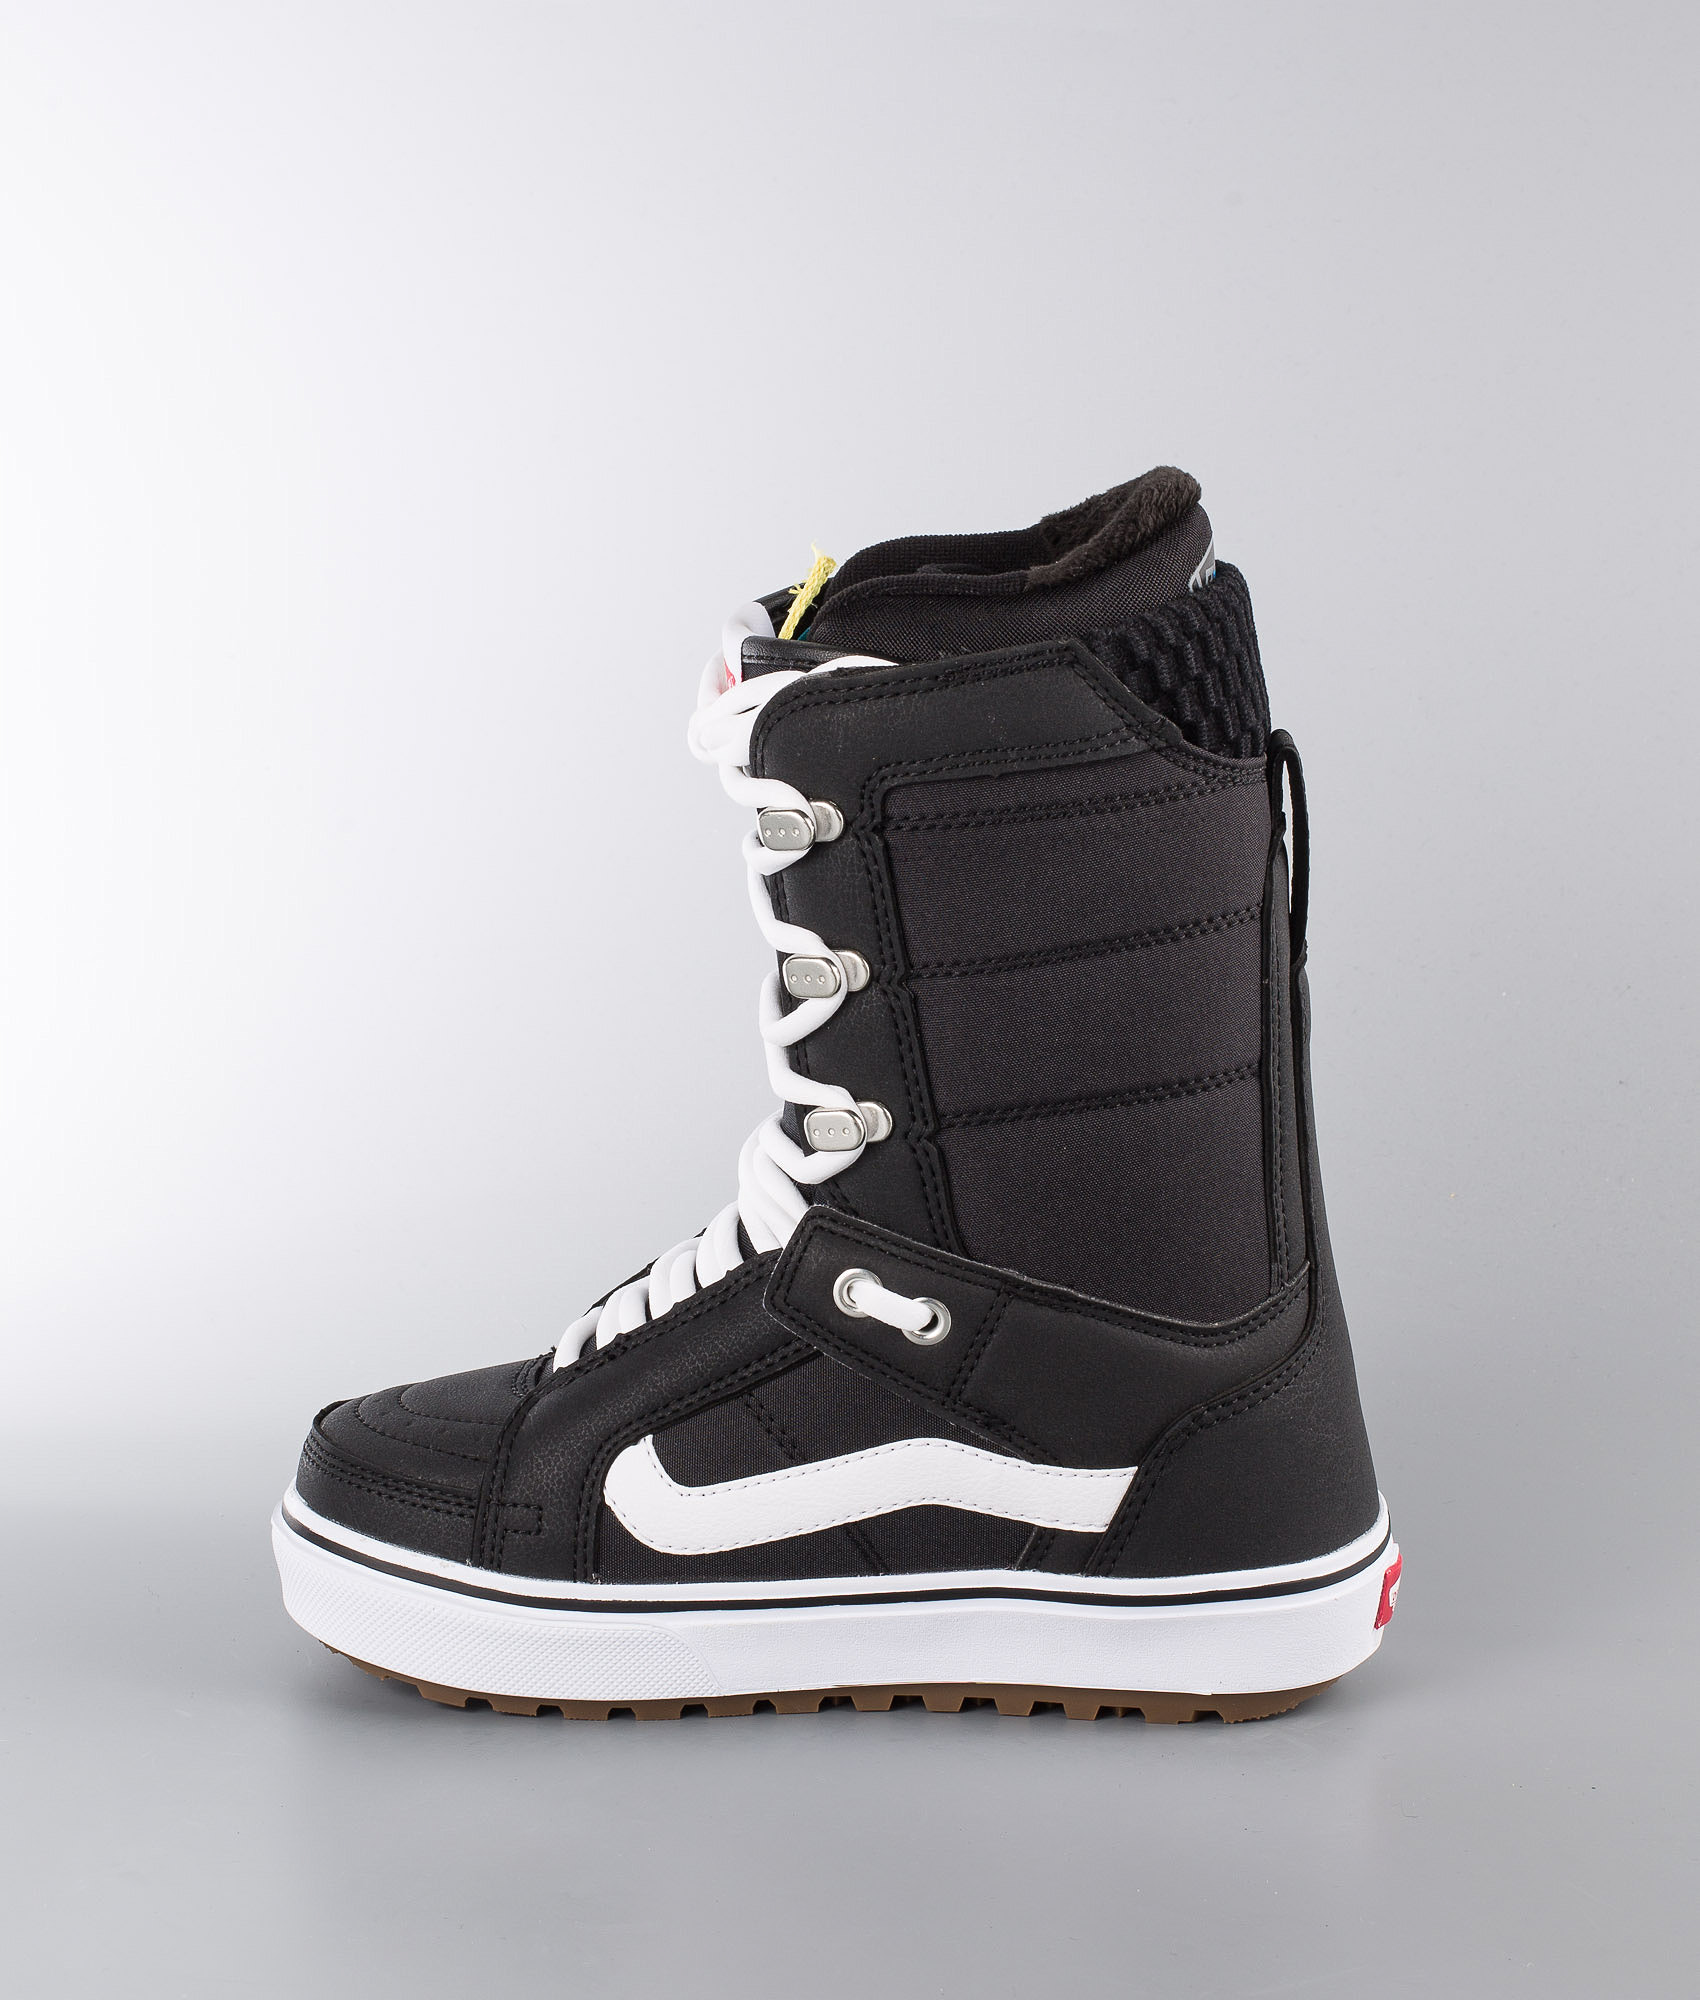 84acc1a20db8 Vans Hi-Standard OG W Snowboard Boots Black White - Ridestore.com